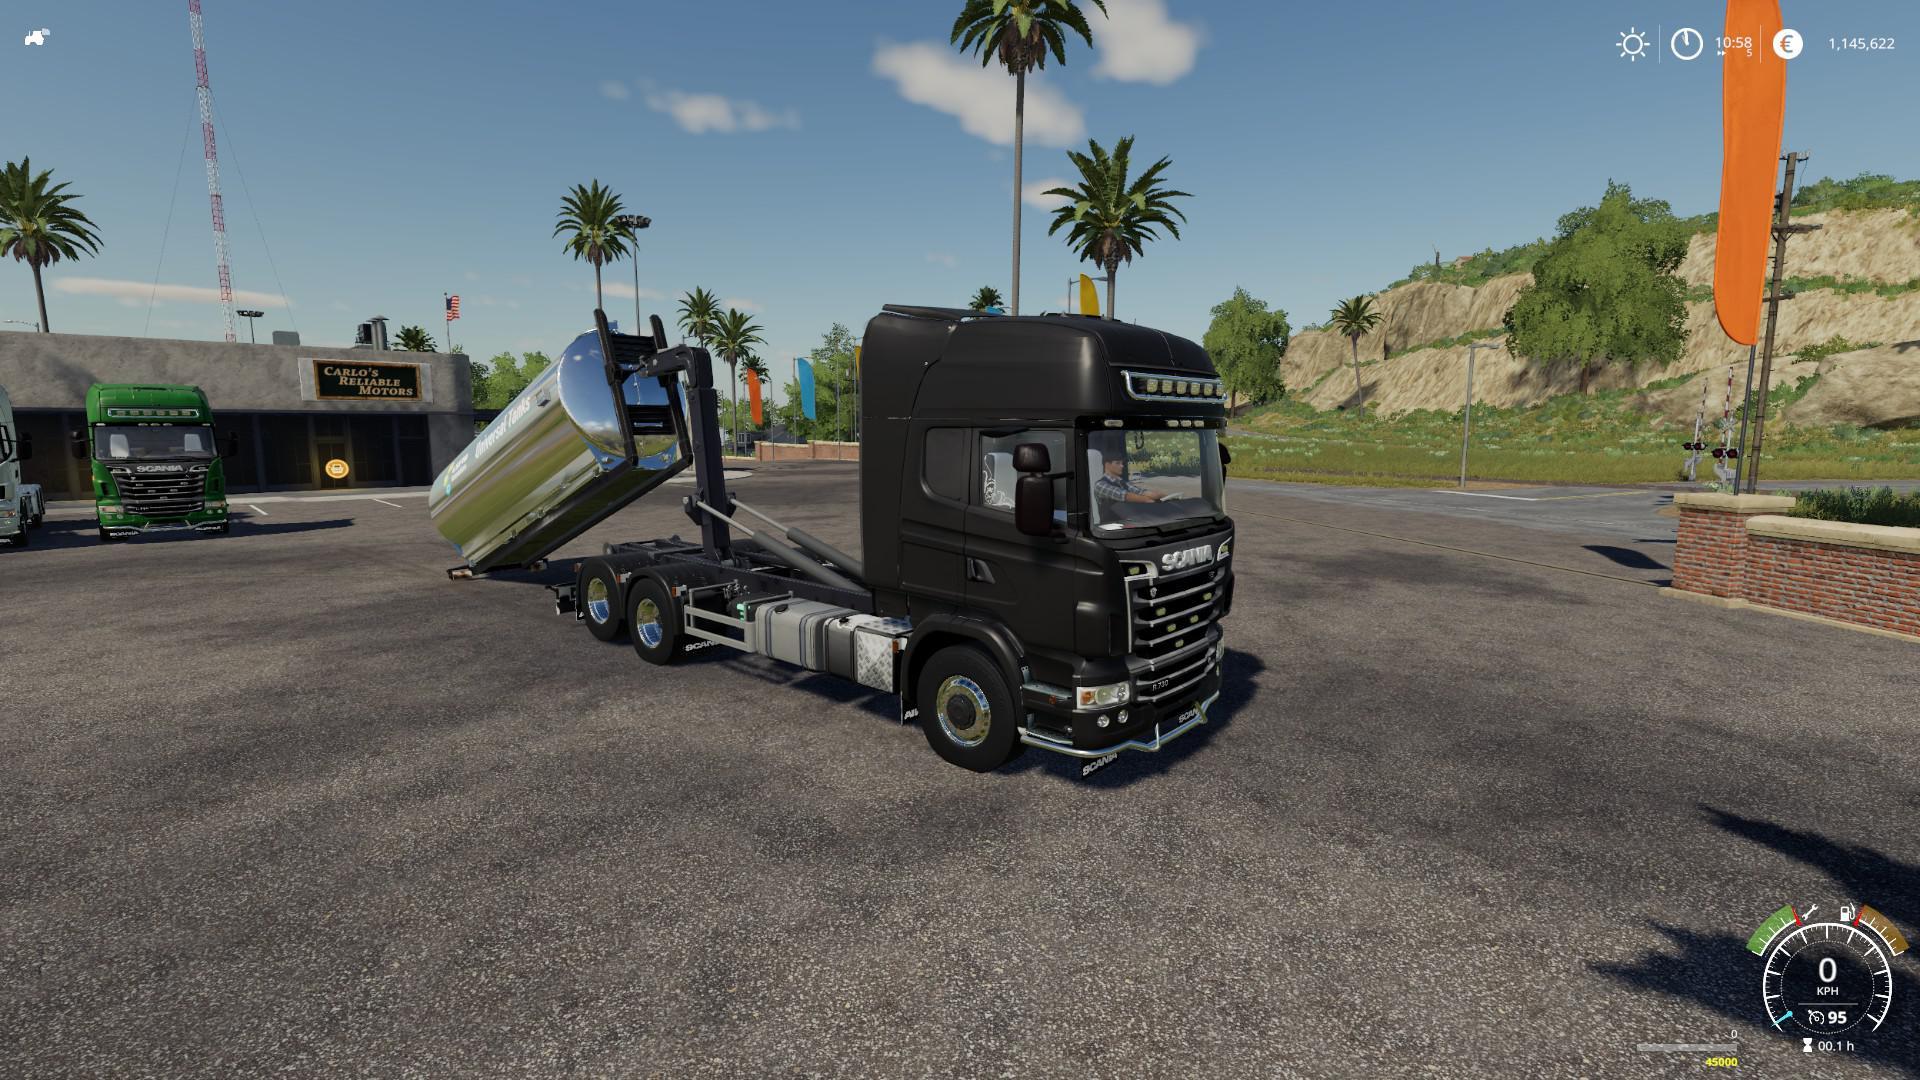 SCANIA R730 HOOKLIFT - Farming Simulator 19 Mods - Ai Cave